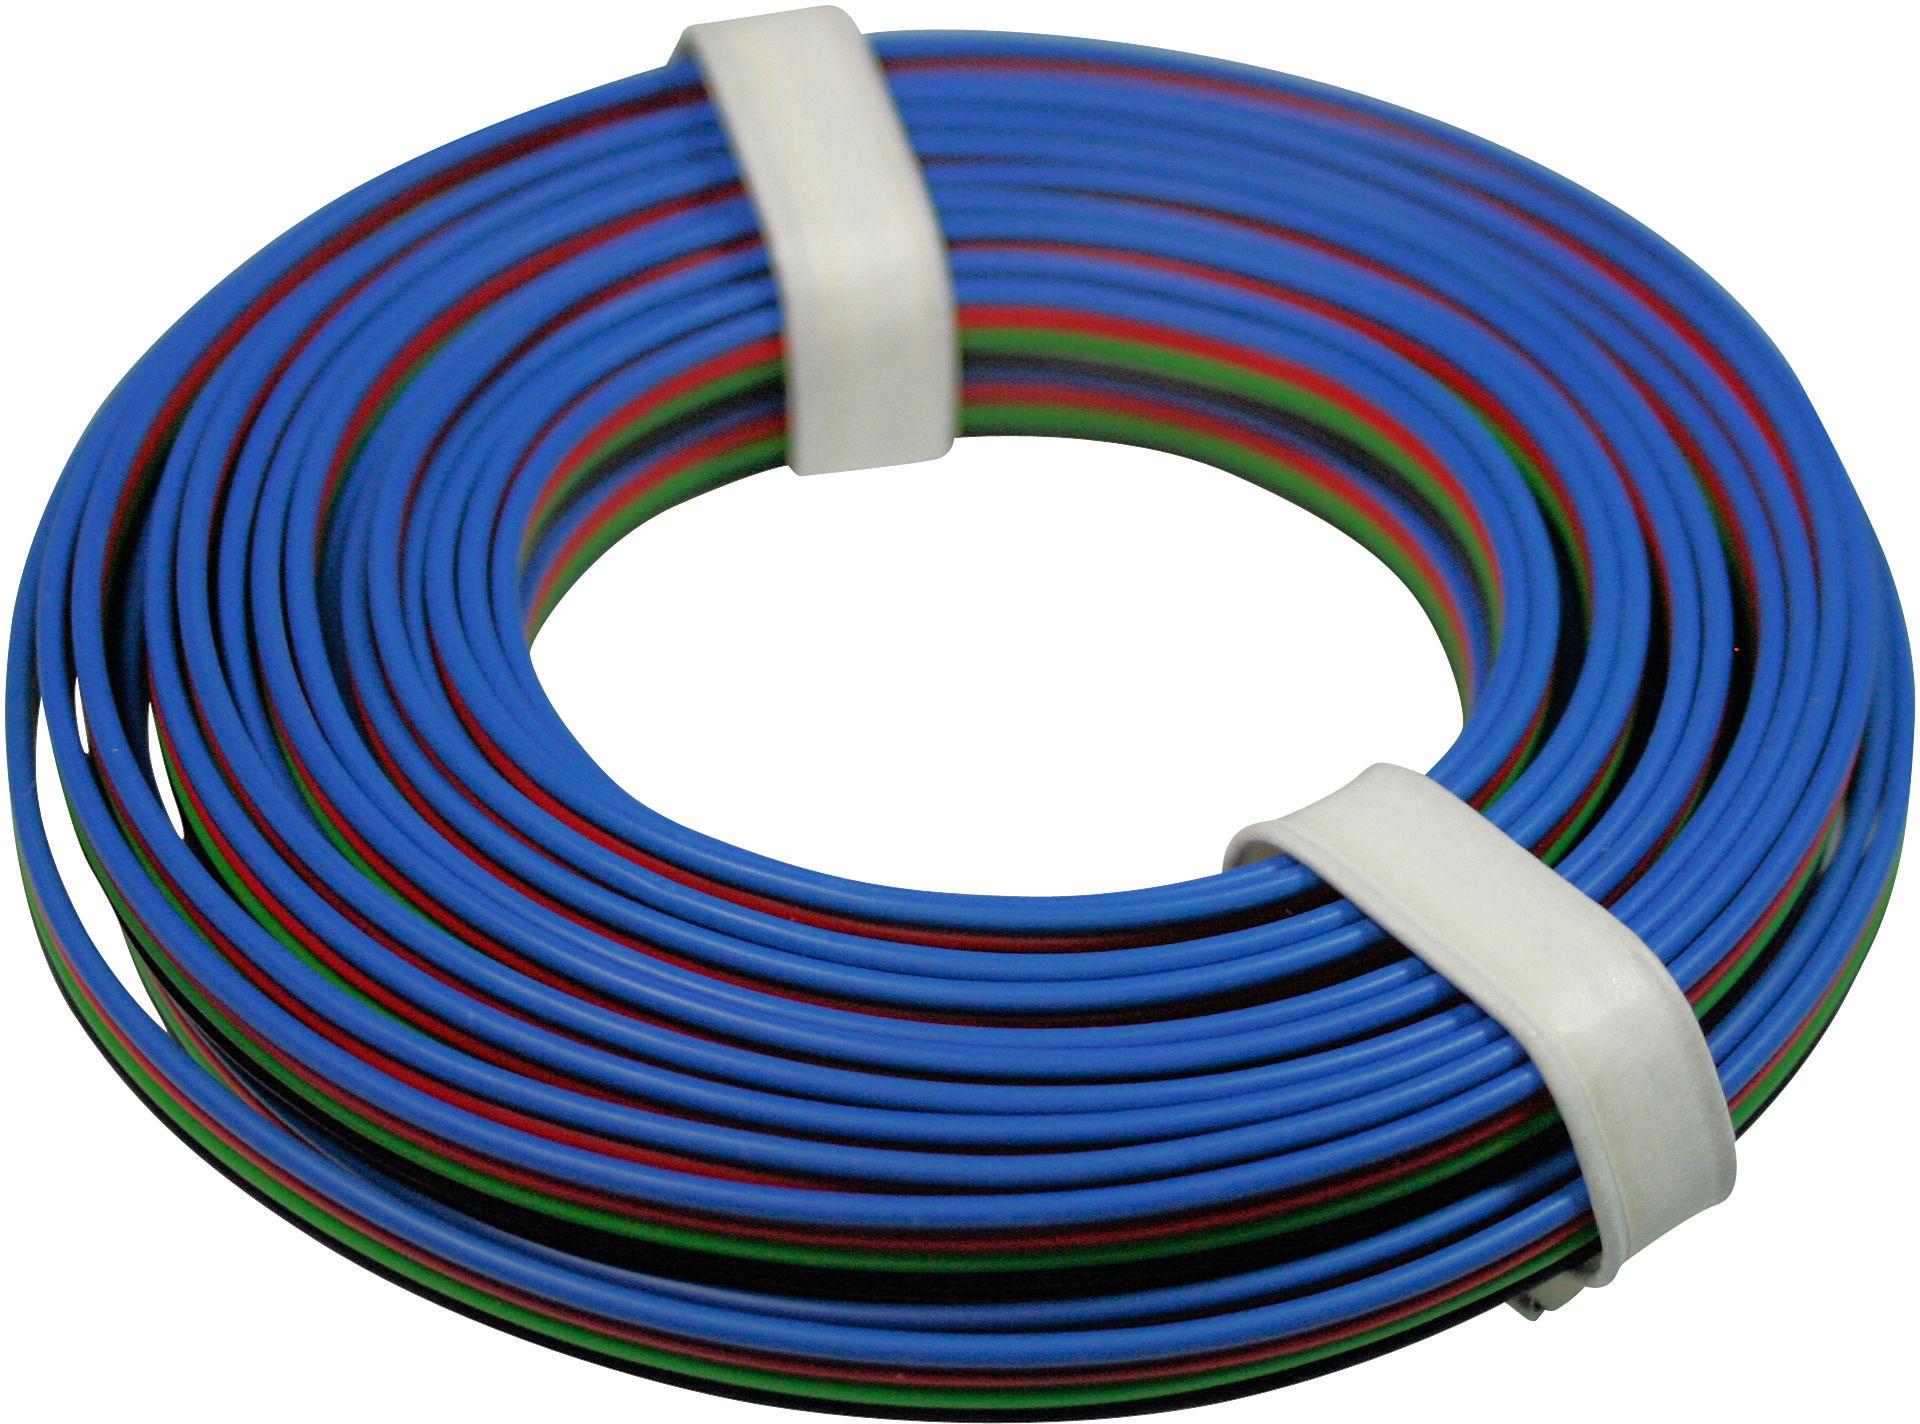 Quad Wire 0,25mm, bk/gn/rd/bl, 5m